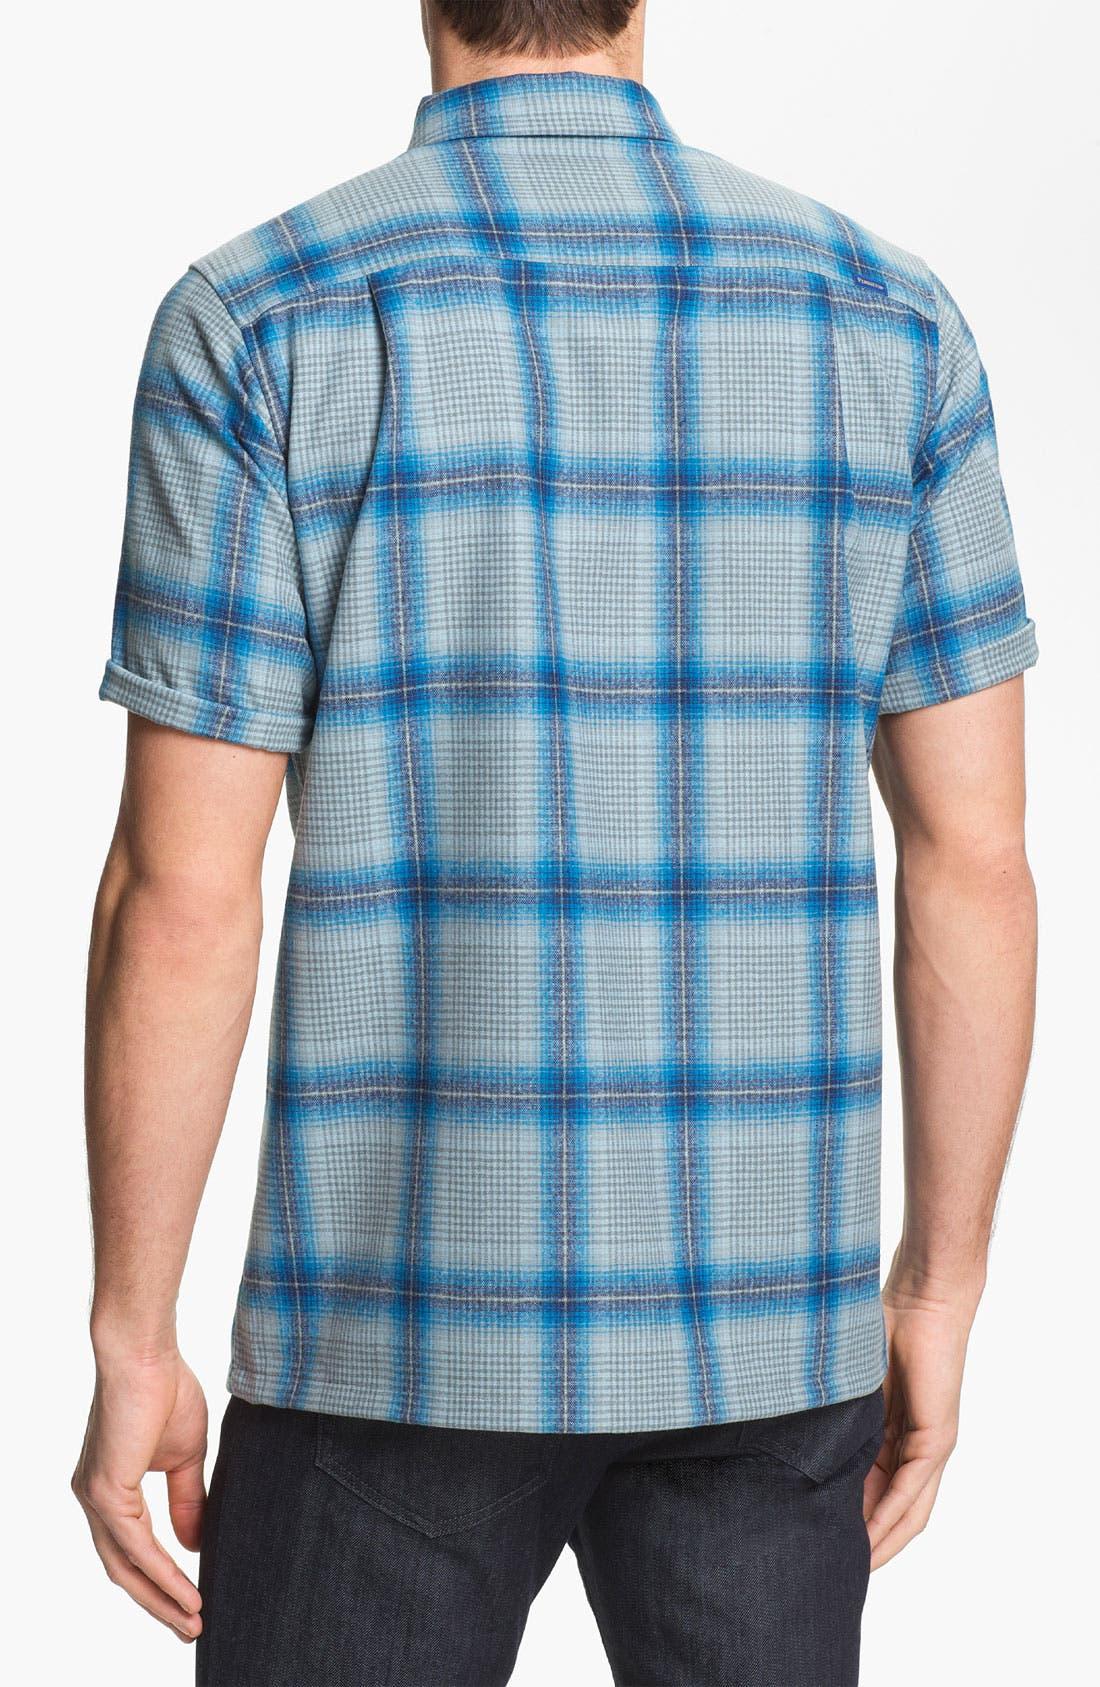 Alternate Image 2  - Pendleton 'Board' Fitted Short Sleeve Wool Shirt